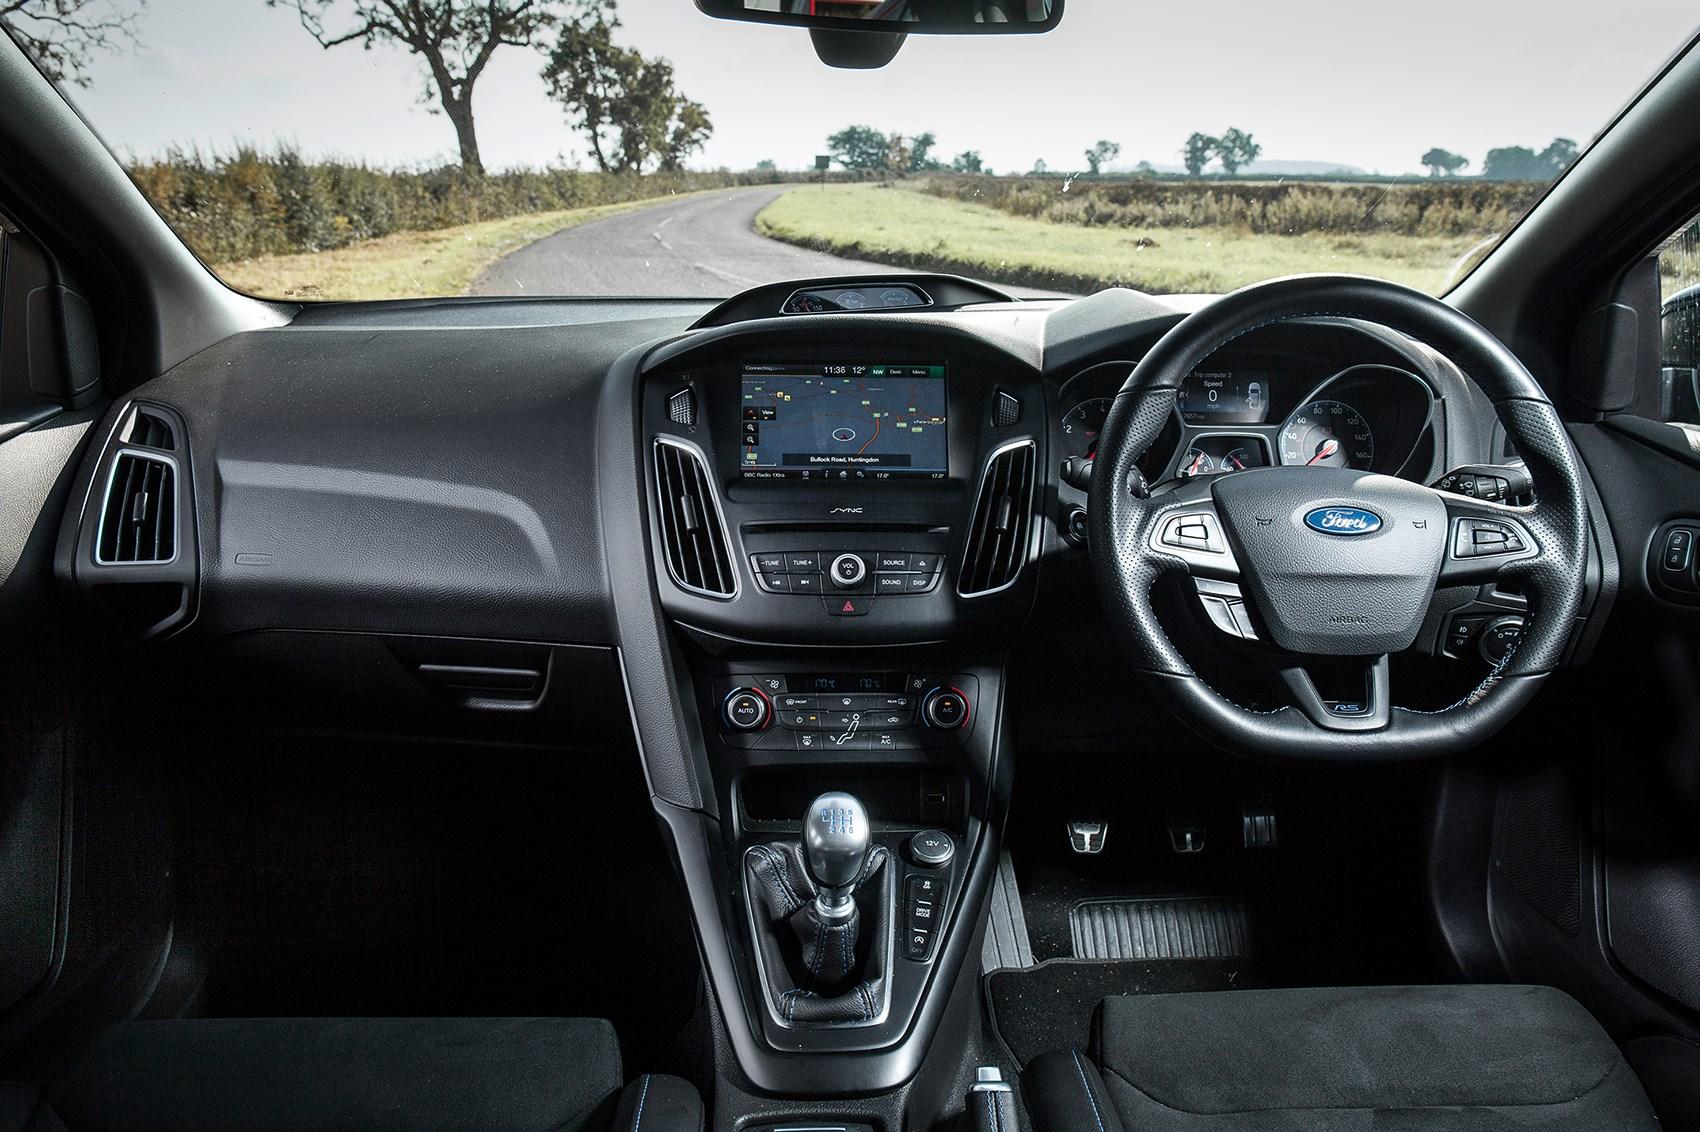 Icon buyer: new Ford Focus RS vs used Mitsubishi Evo VI